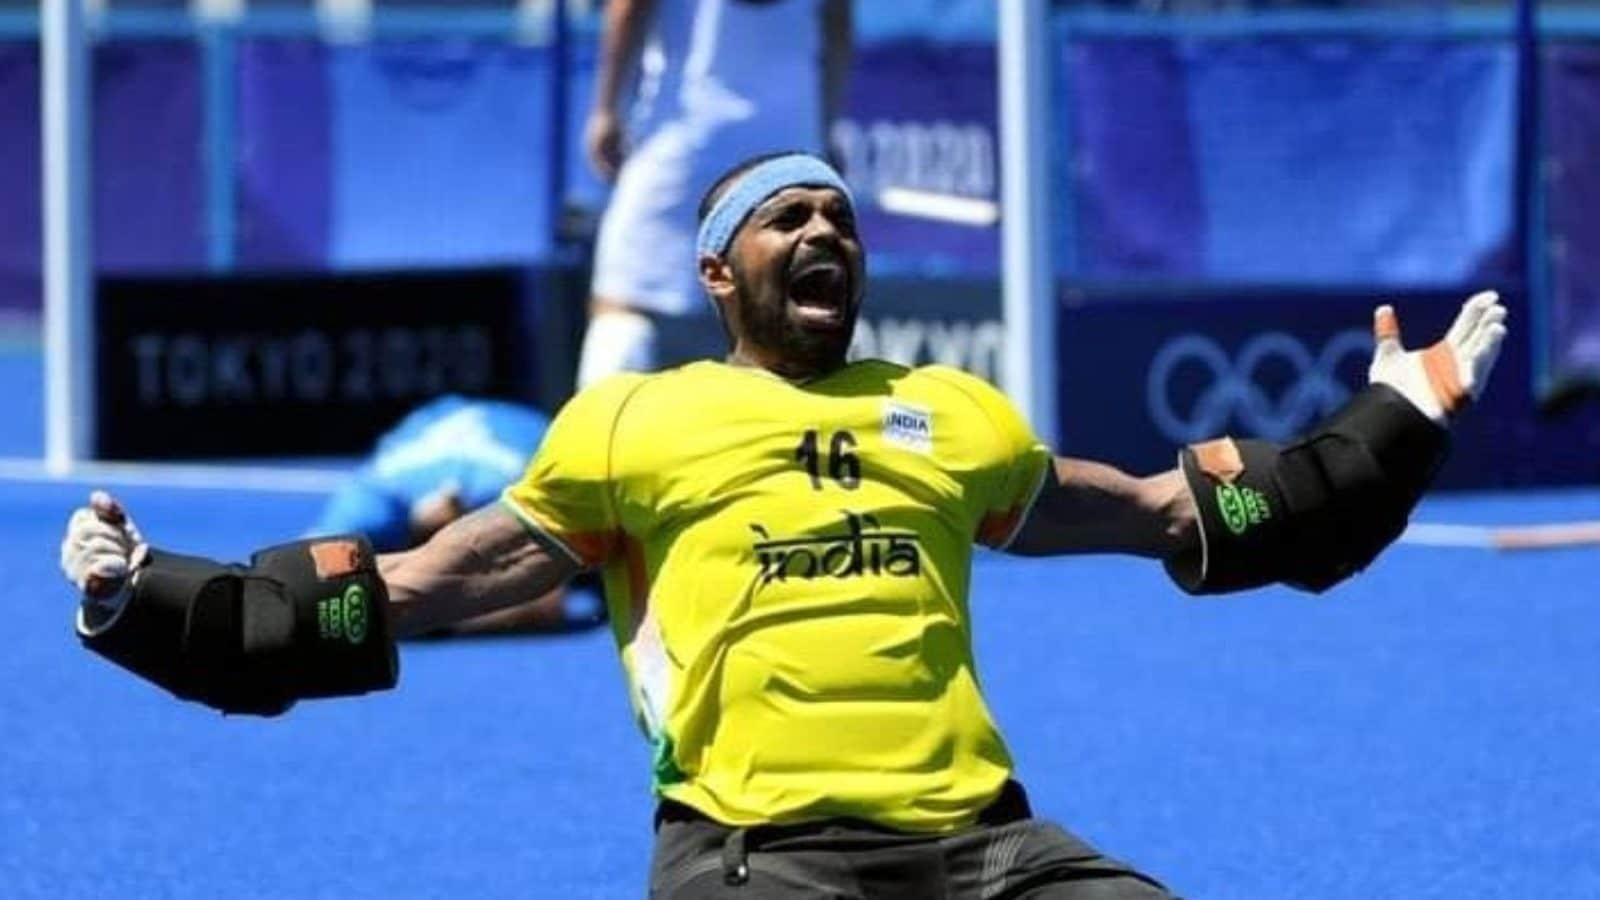 PS Sreejesh Shares Joyous Photo on Social Media After Historic Win at Tokyo Olympics